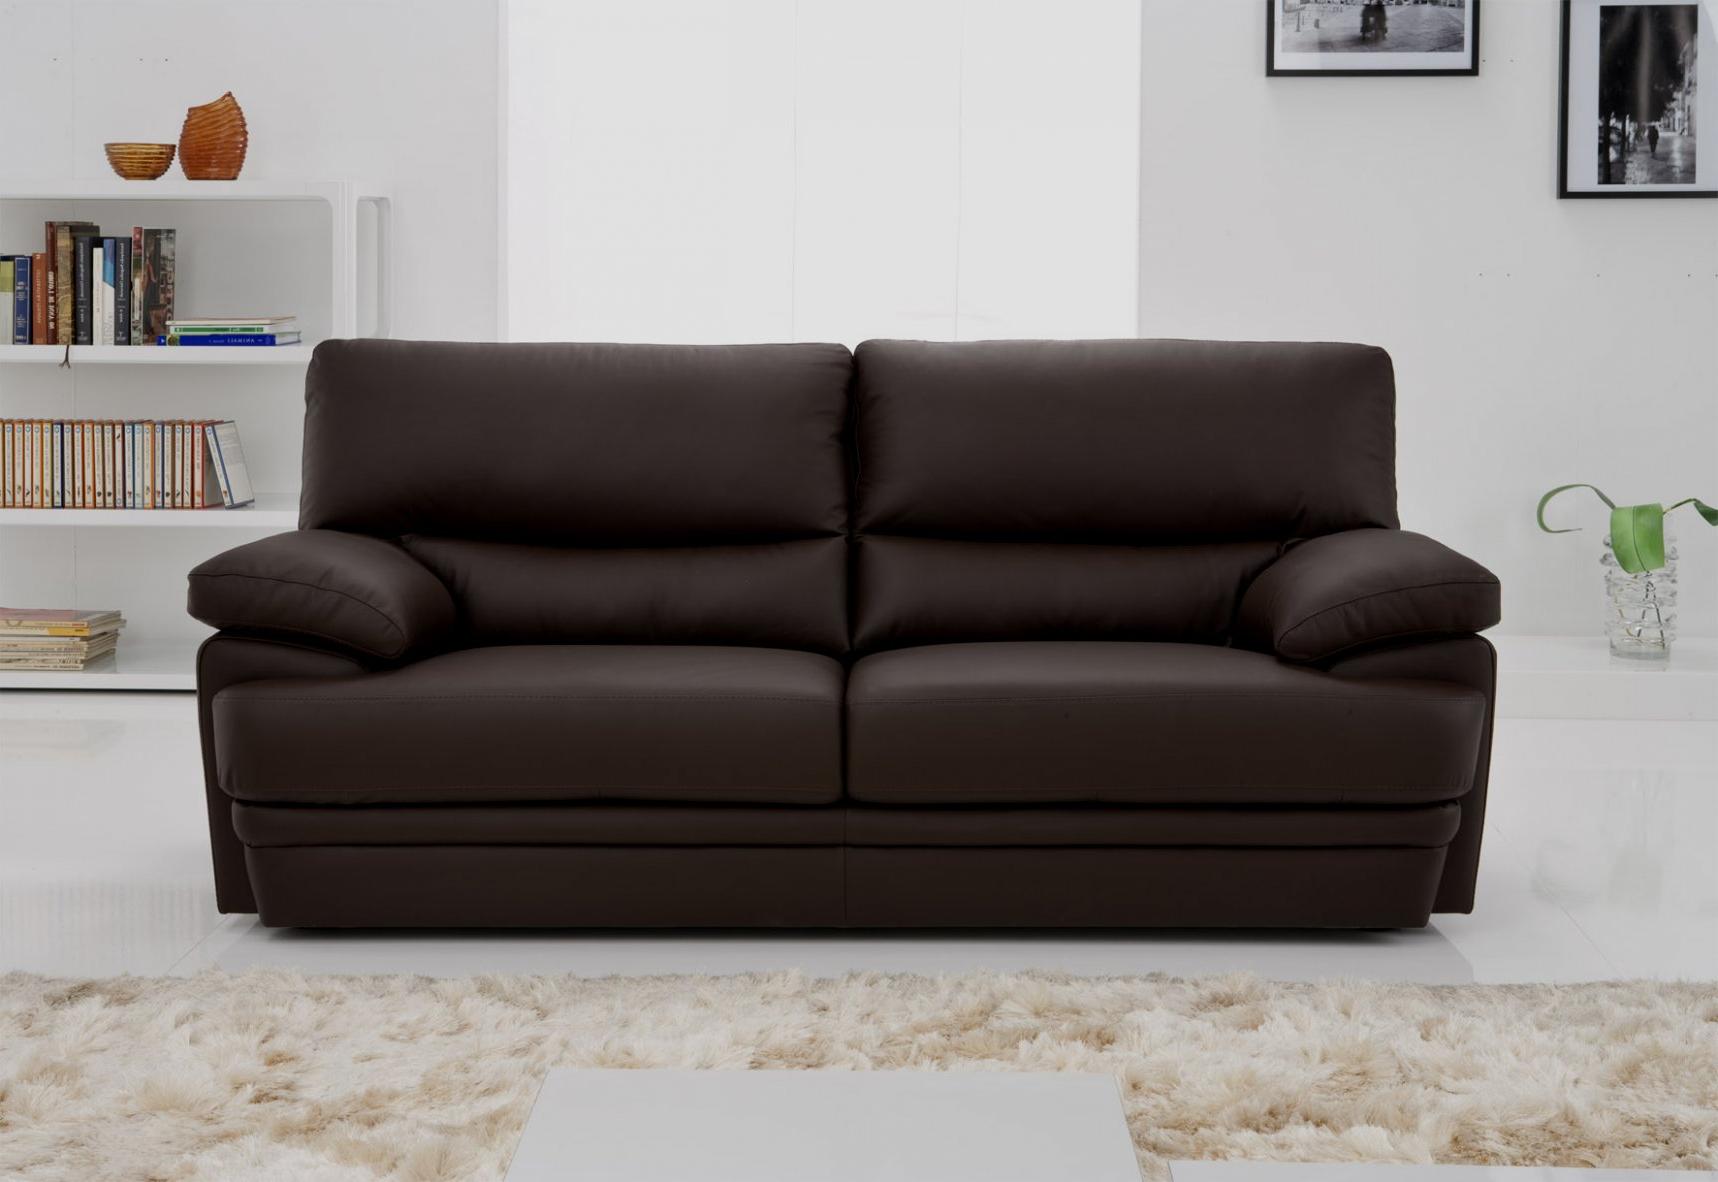 Tapizar sofa Precio Madrid U3dh Tapizar sofa Precio Madrid Lindo Tapizados sofas Precios Simple